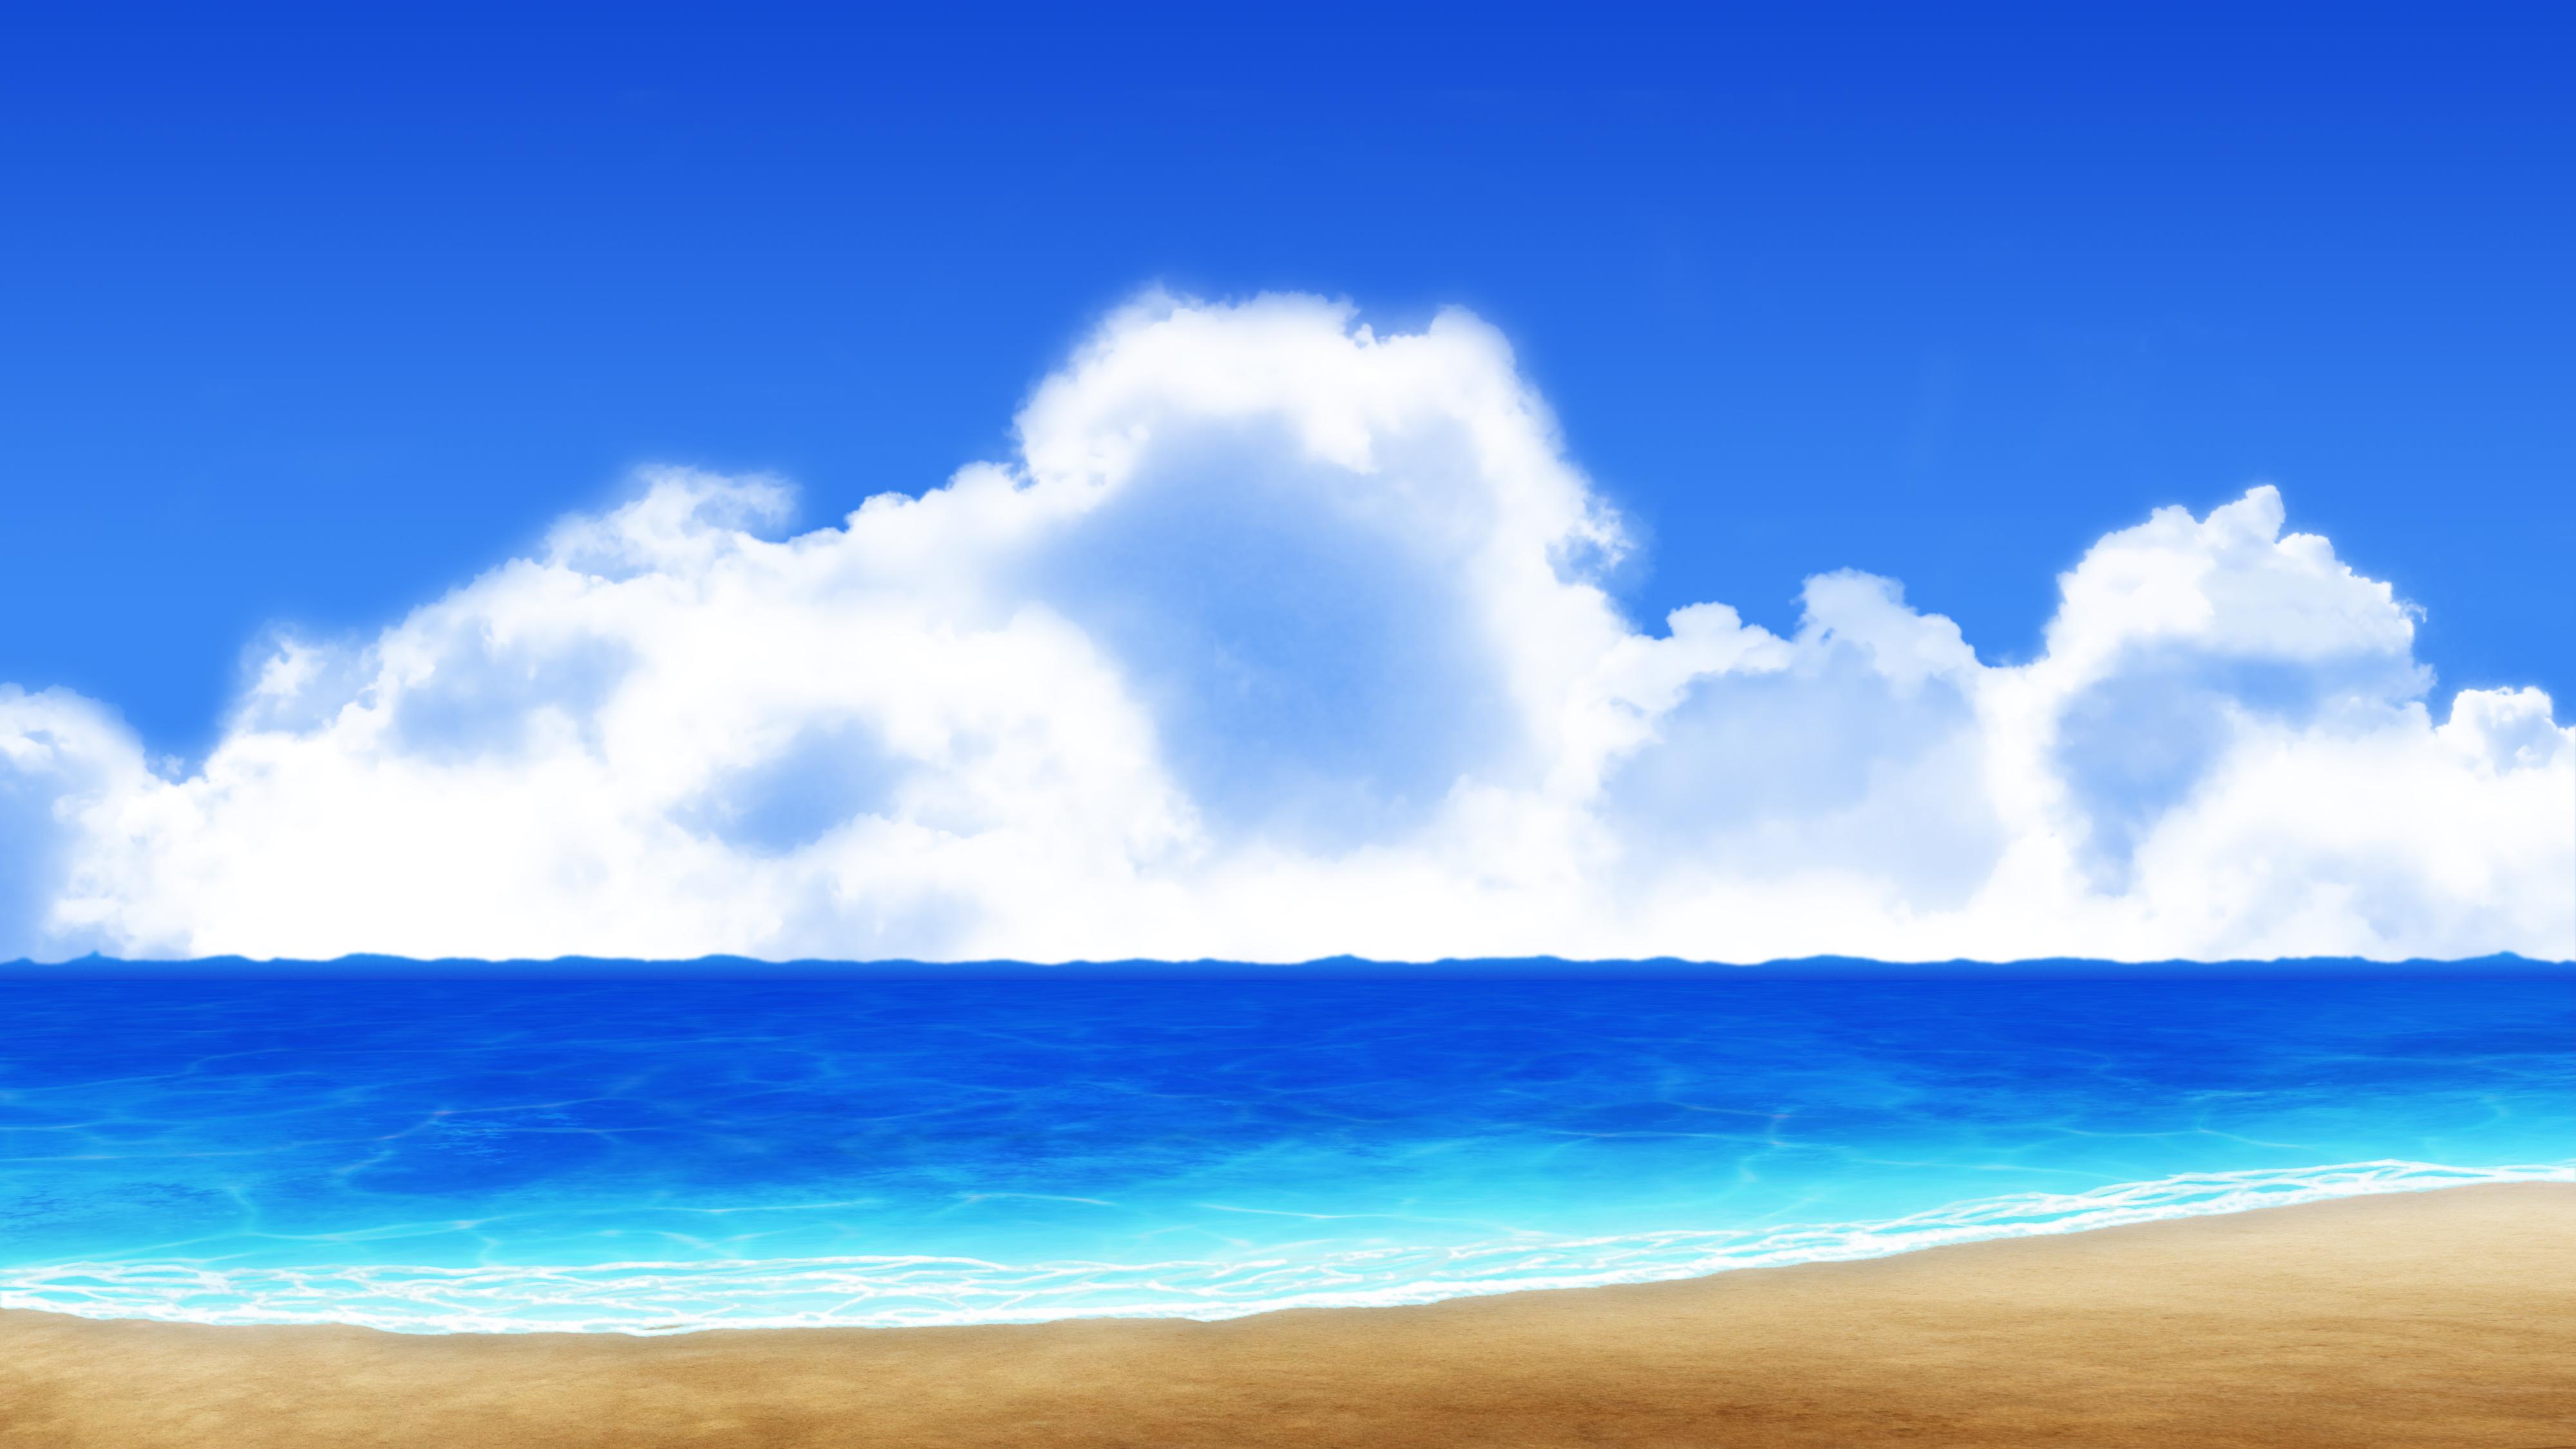 background animestyled beach type 11 by akiranyo on